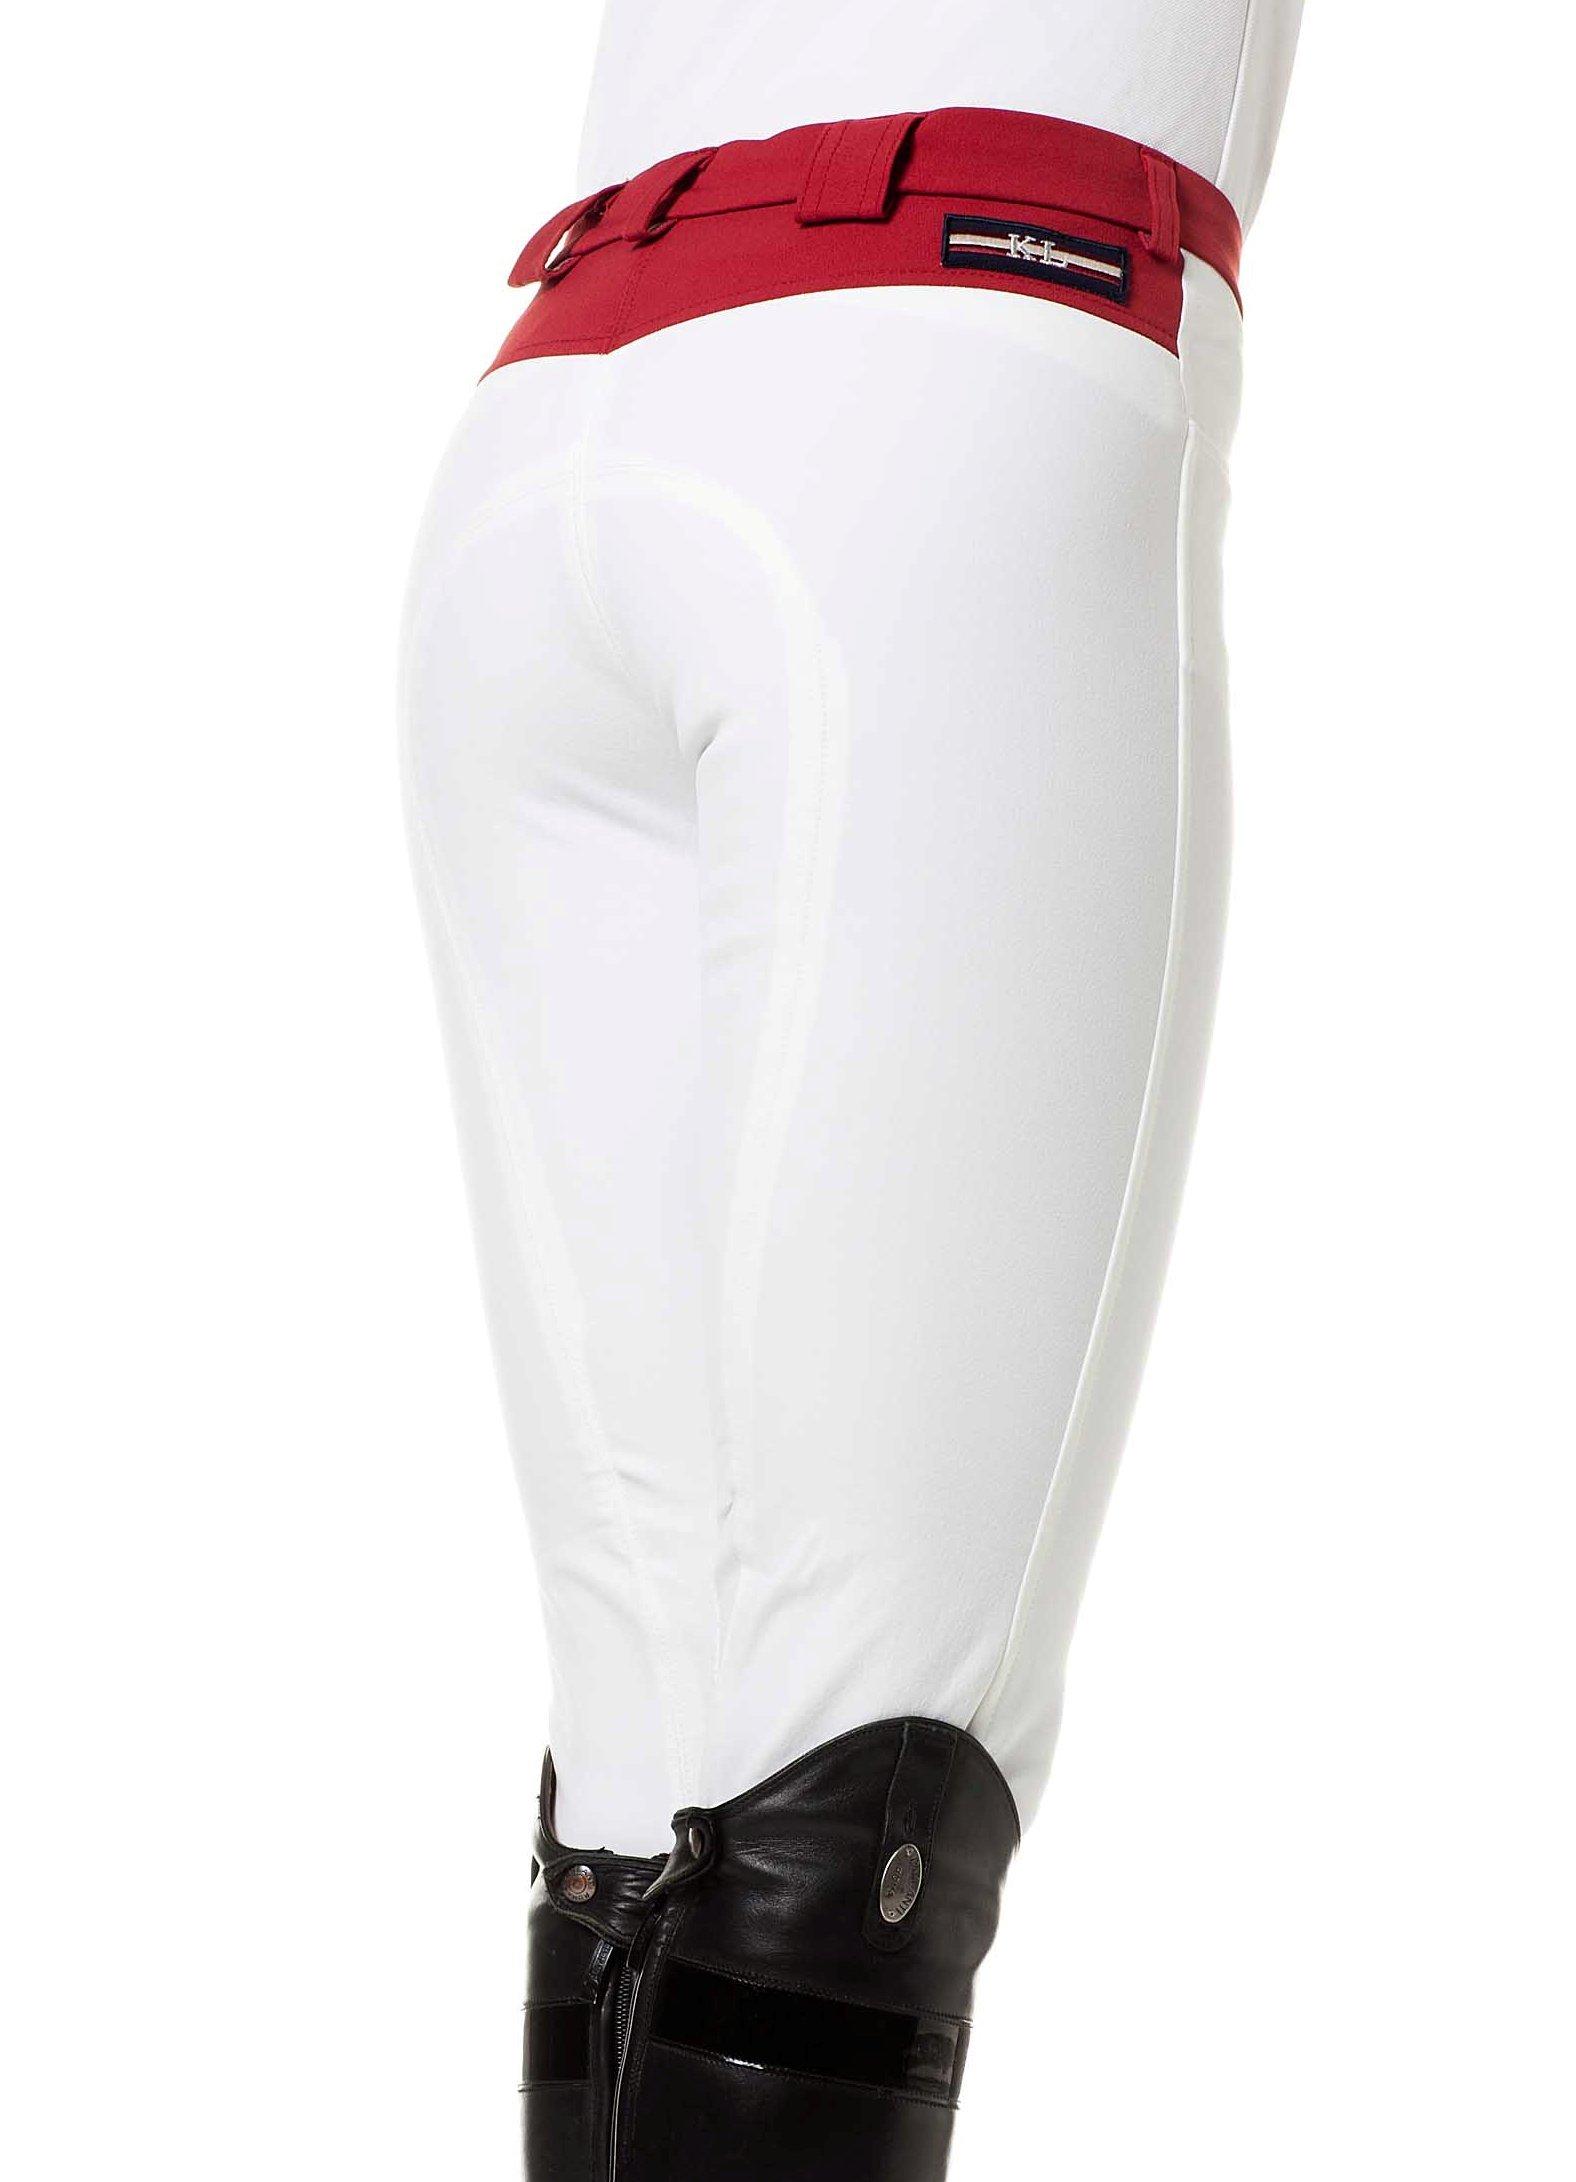 Kingsland Equestrian Women's Kingsland Jessica Style Breech-White/Red-Usa 24/Xs by Kingsland Equestrian